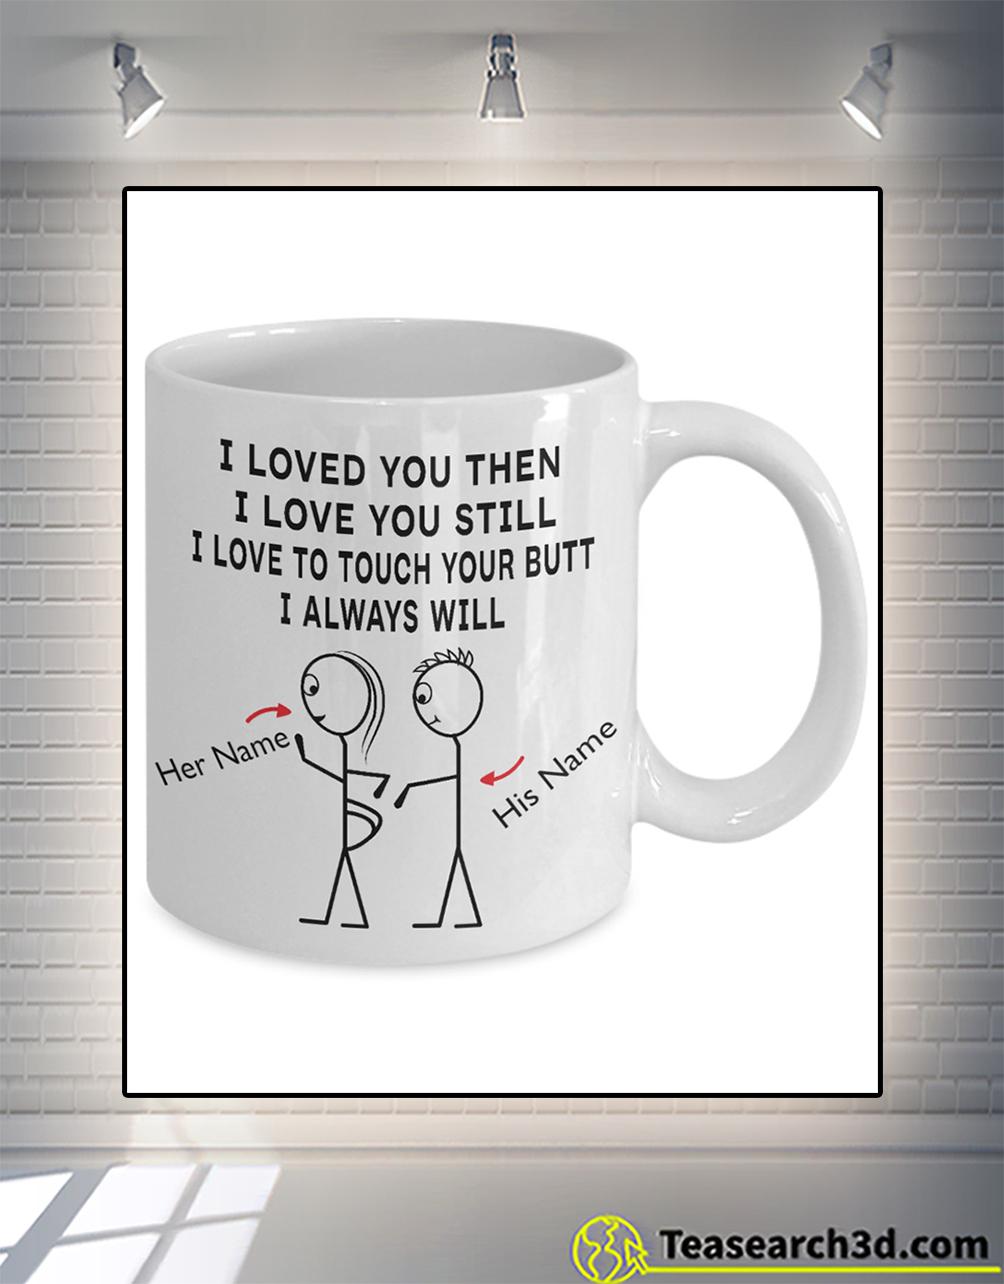 I love you then I love you still personalized custom name mug 11oz